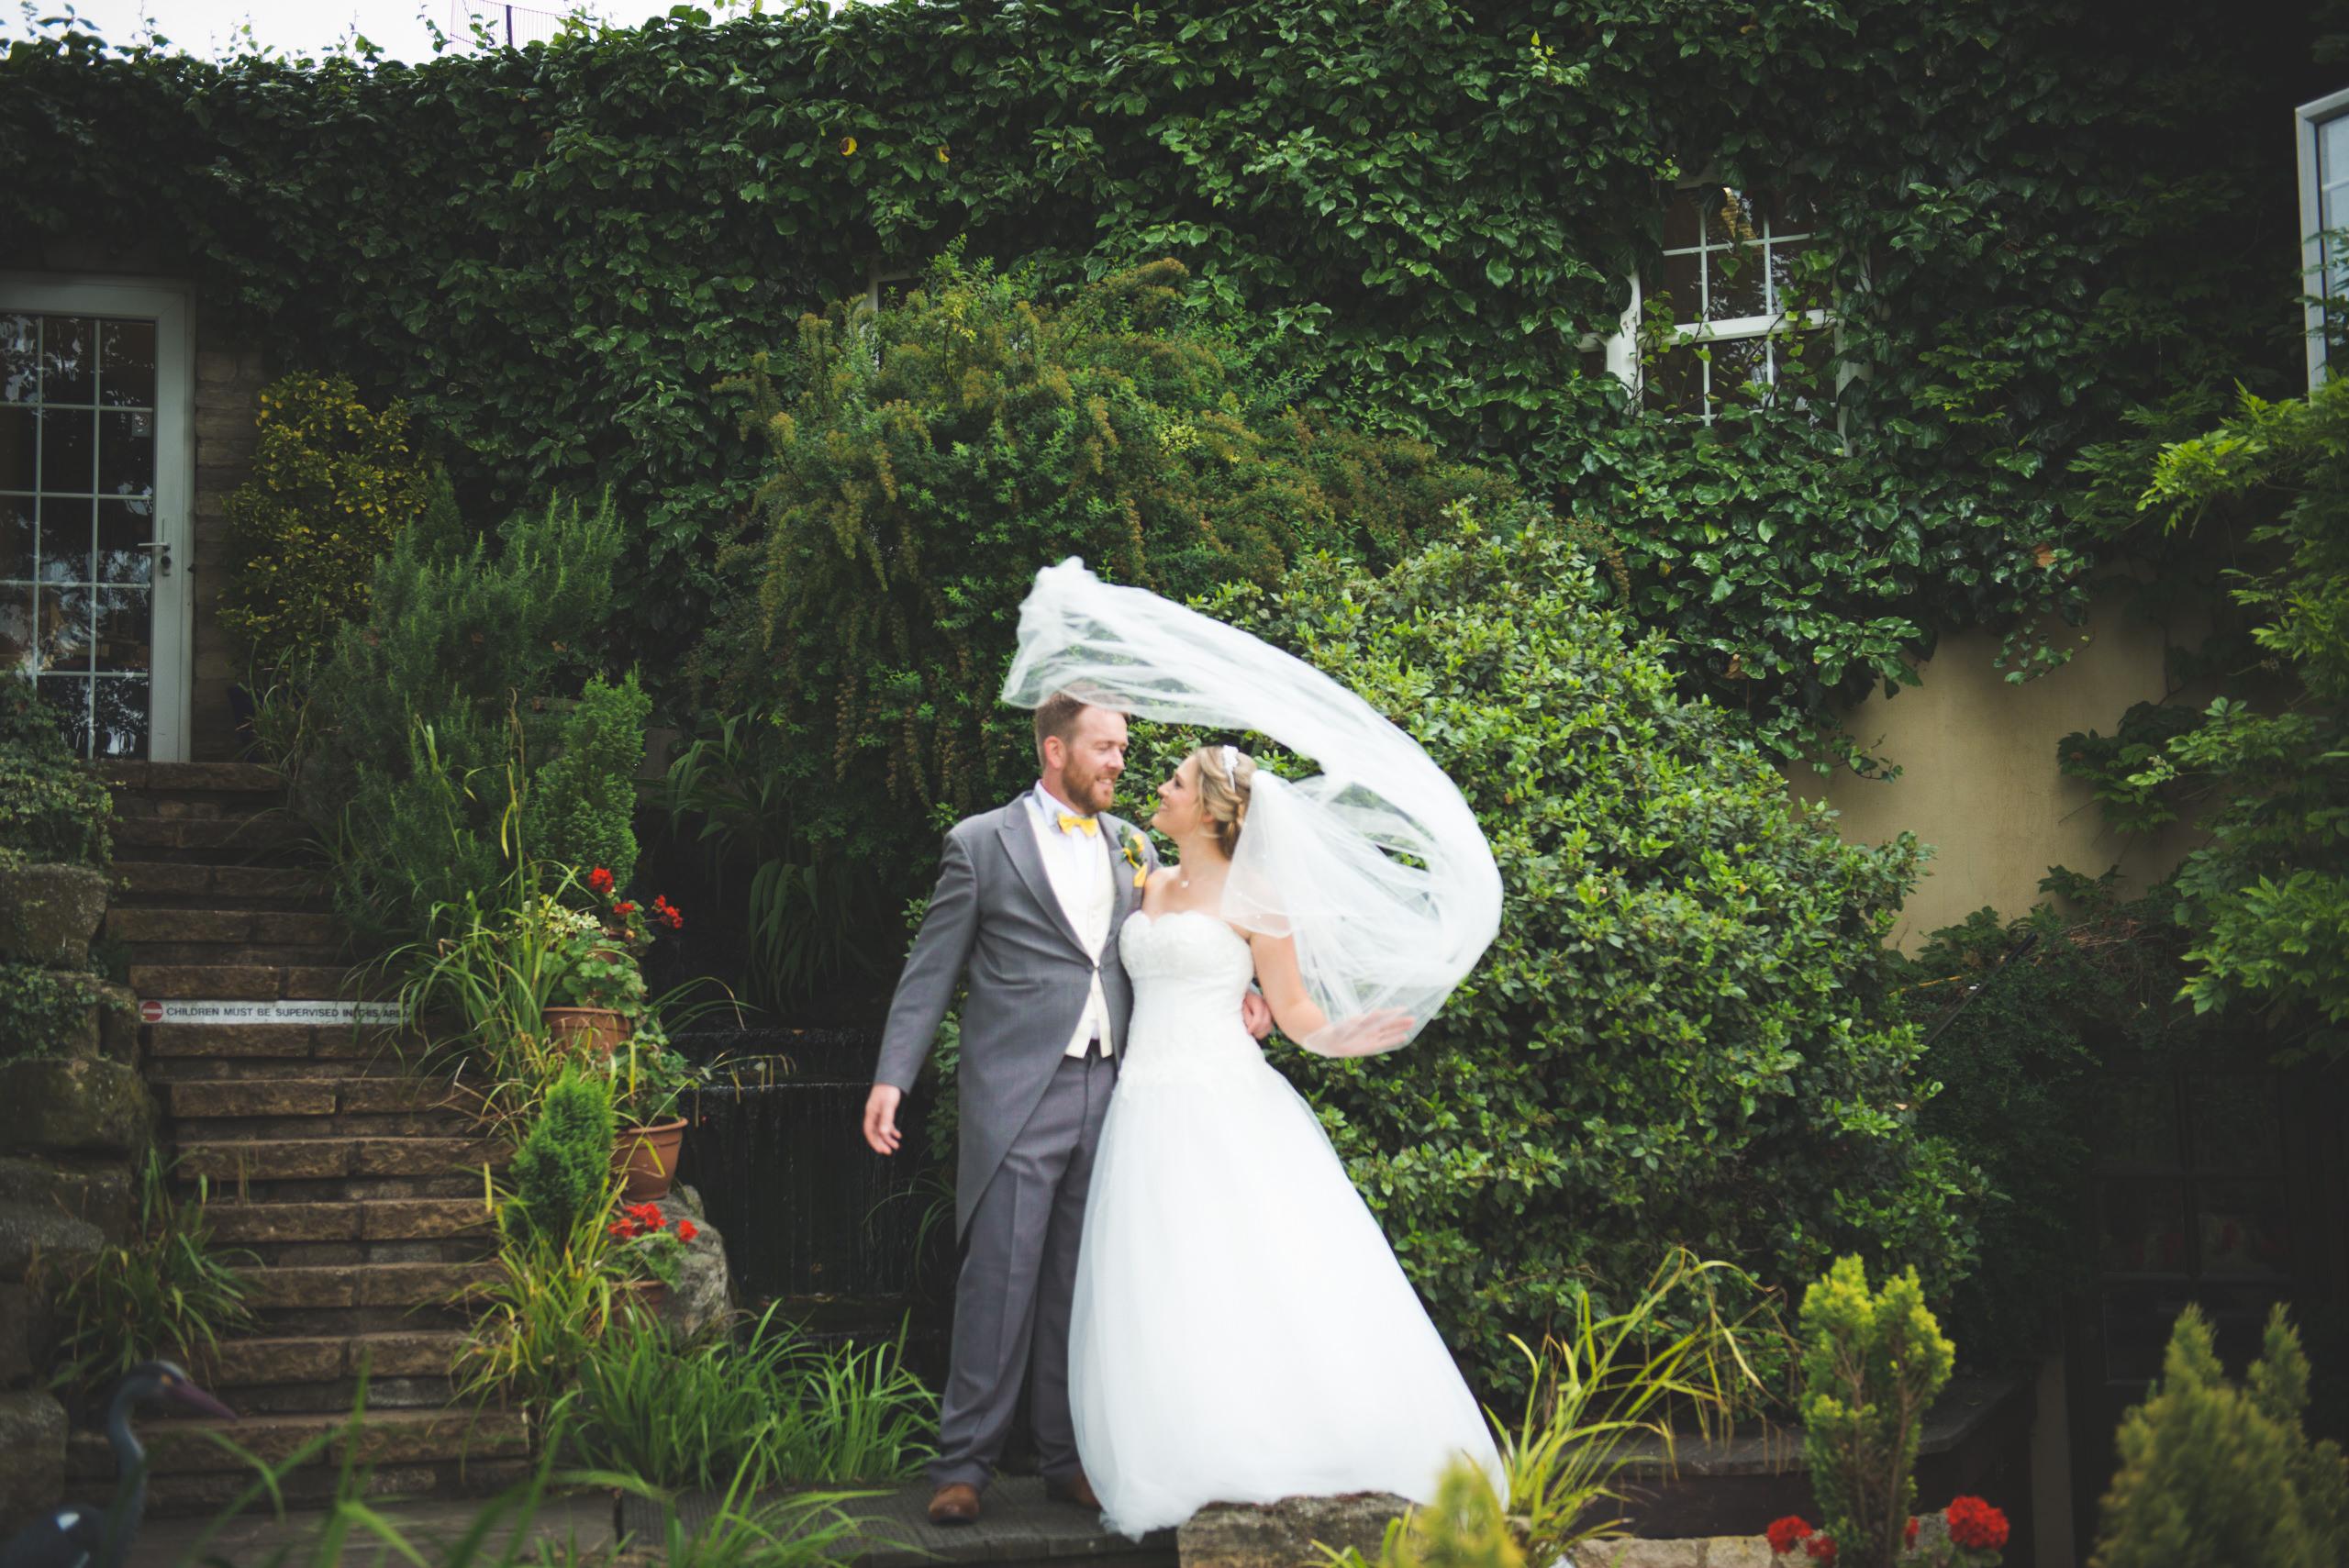 windy wedding, veil not playing ball, veil, wedding photography, wedding photographer, bride and groom, whittlebury hall wedding, wedding photographer northamptonshire